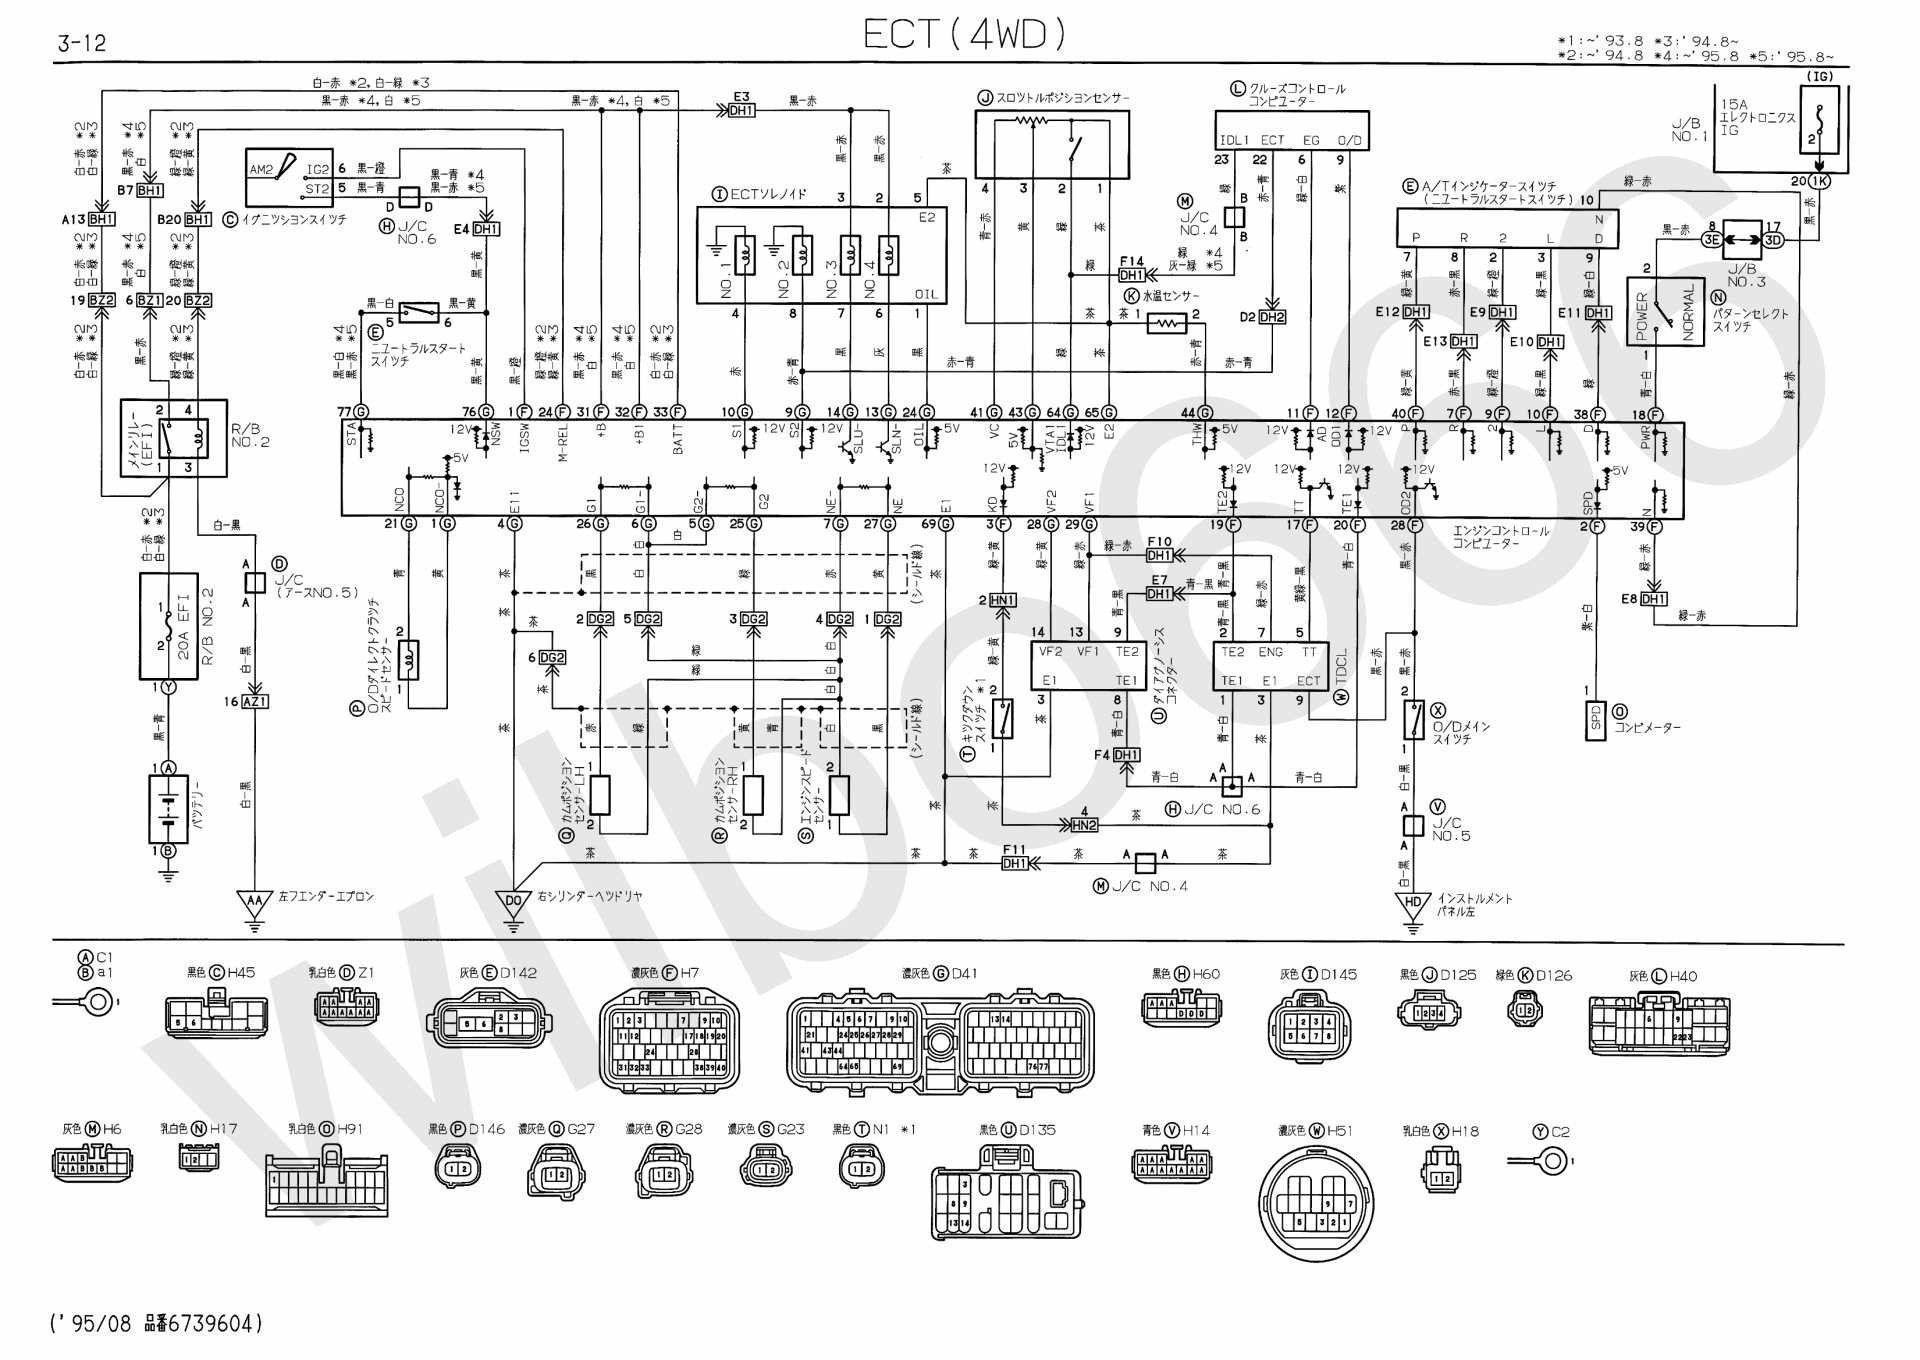 Unique Bmw Amplifier Wiring Diagram | Site plan, Diagram, How to plan | X3 Radio Wiring Diagram |  | Pinterest